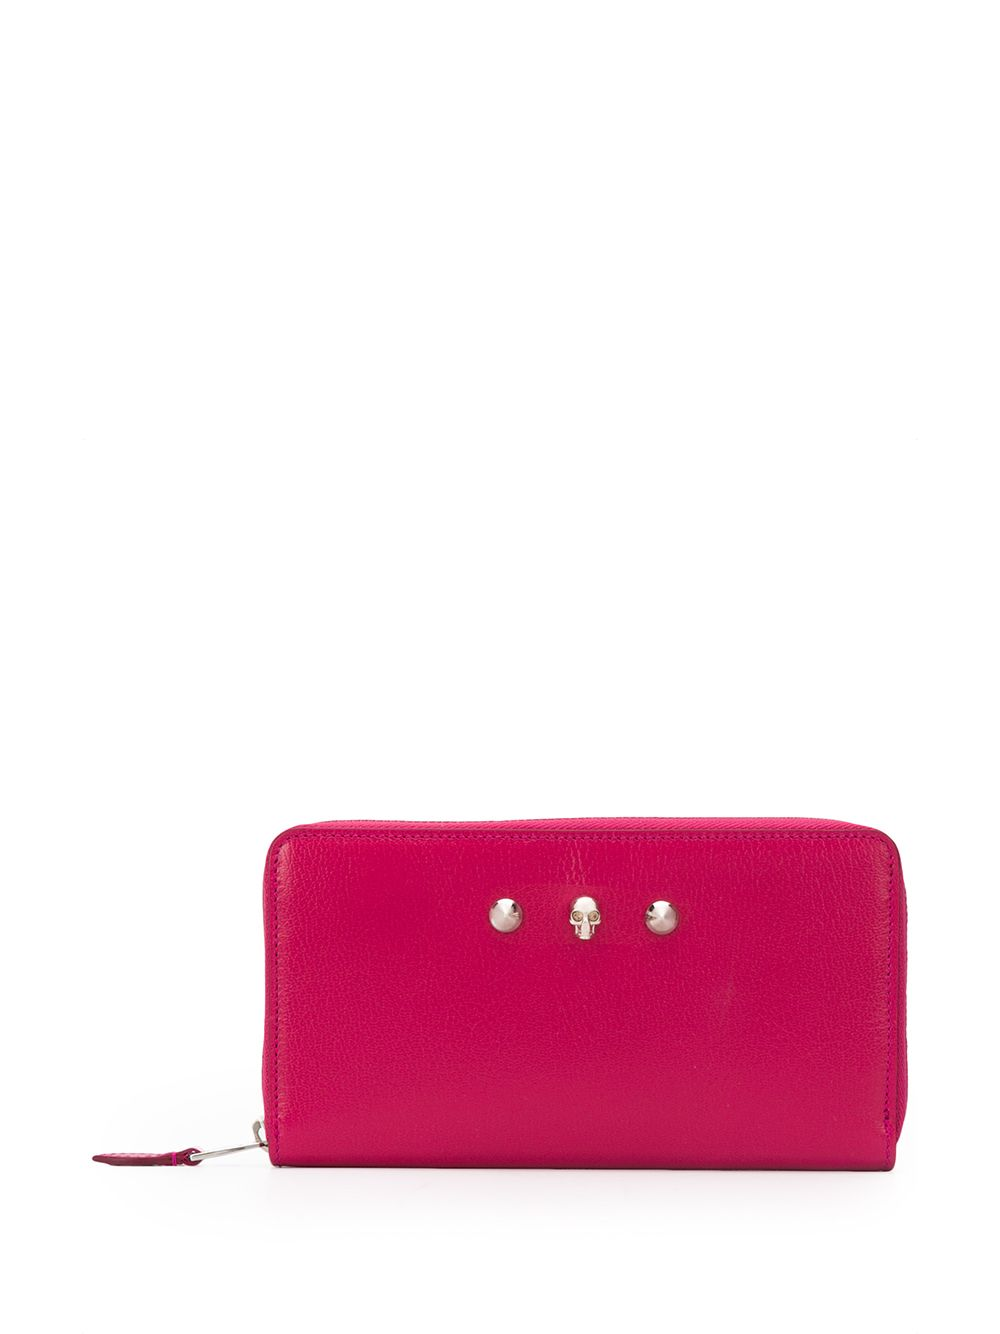 Zip Around Continental Leather Wallet